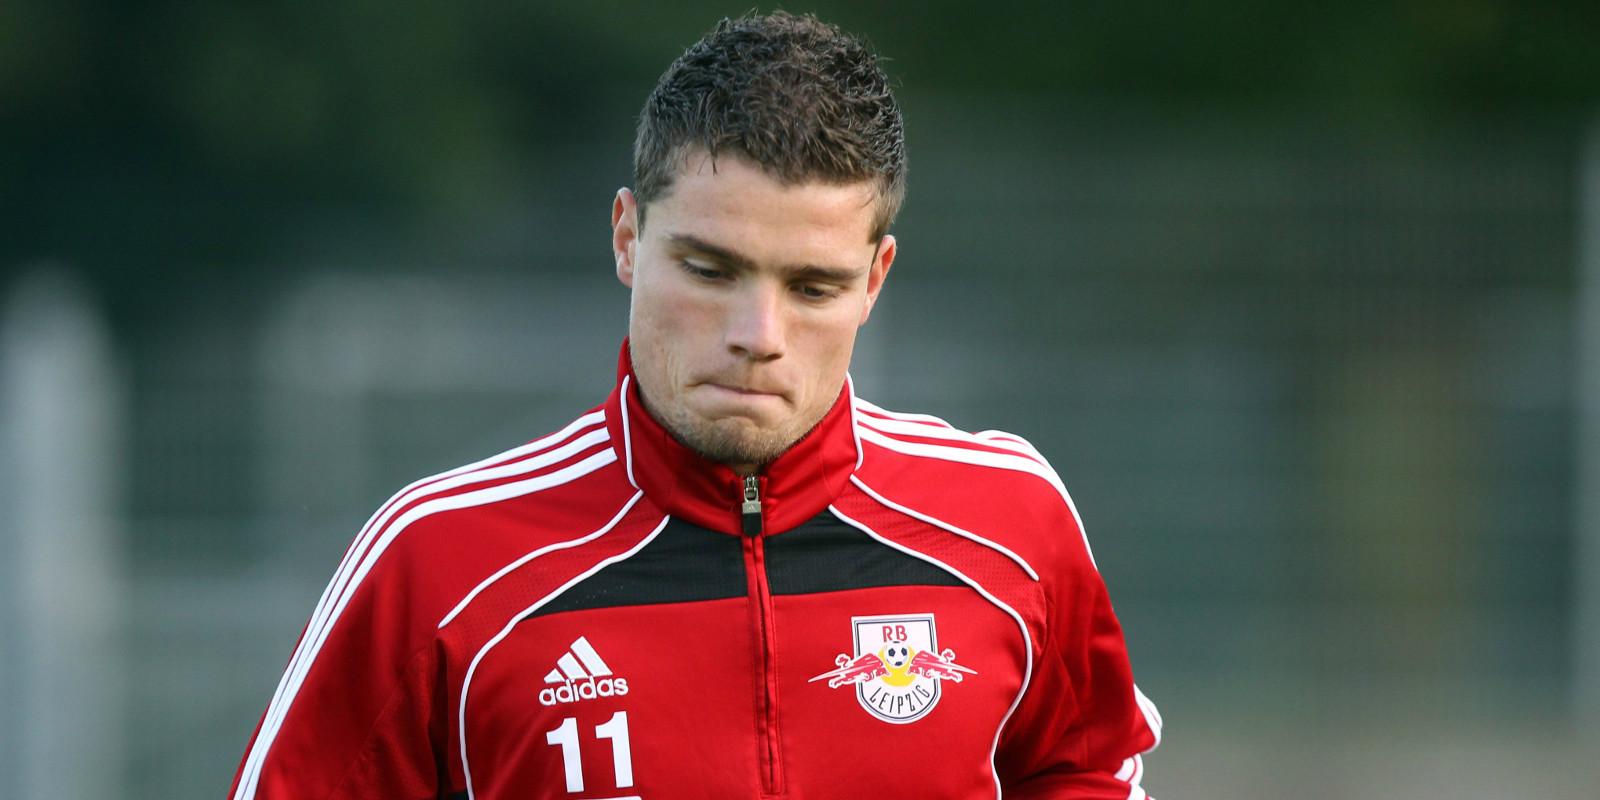 Robert Klauß übernimmt ab kommender Saison die U23